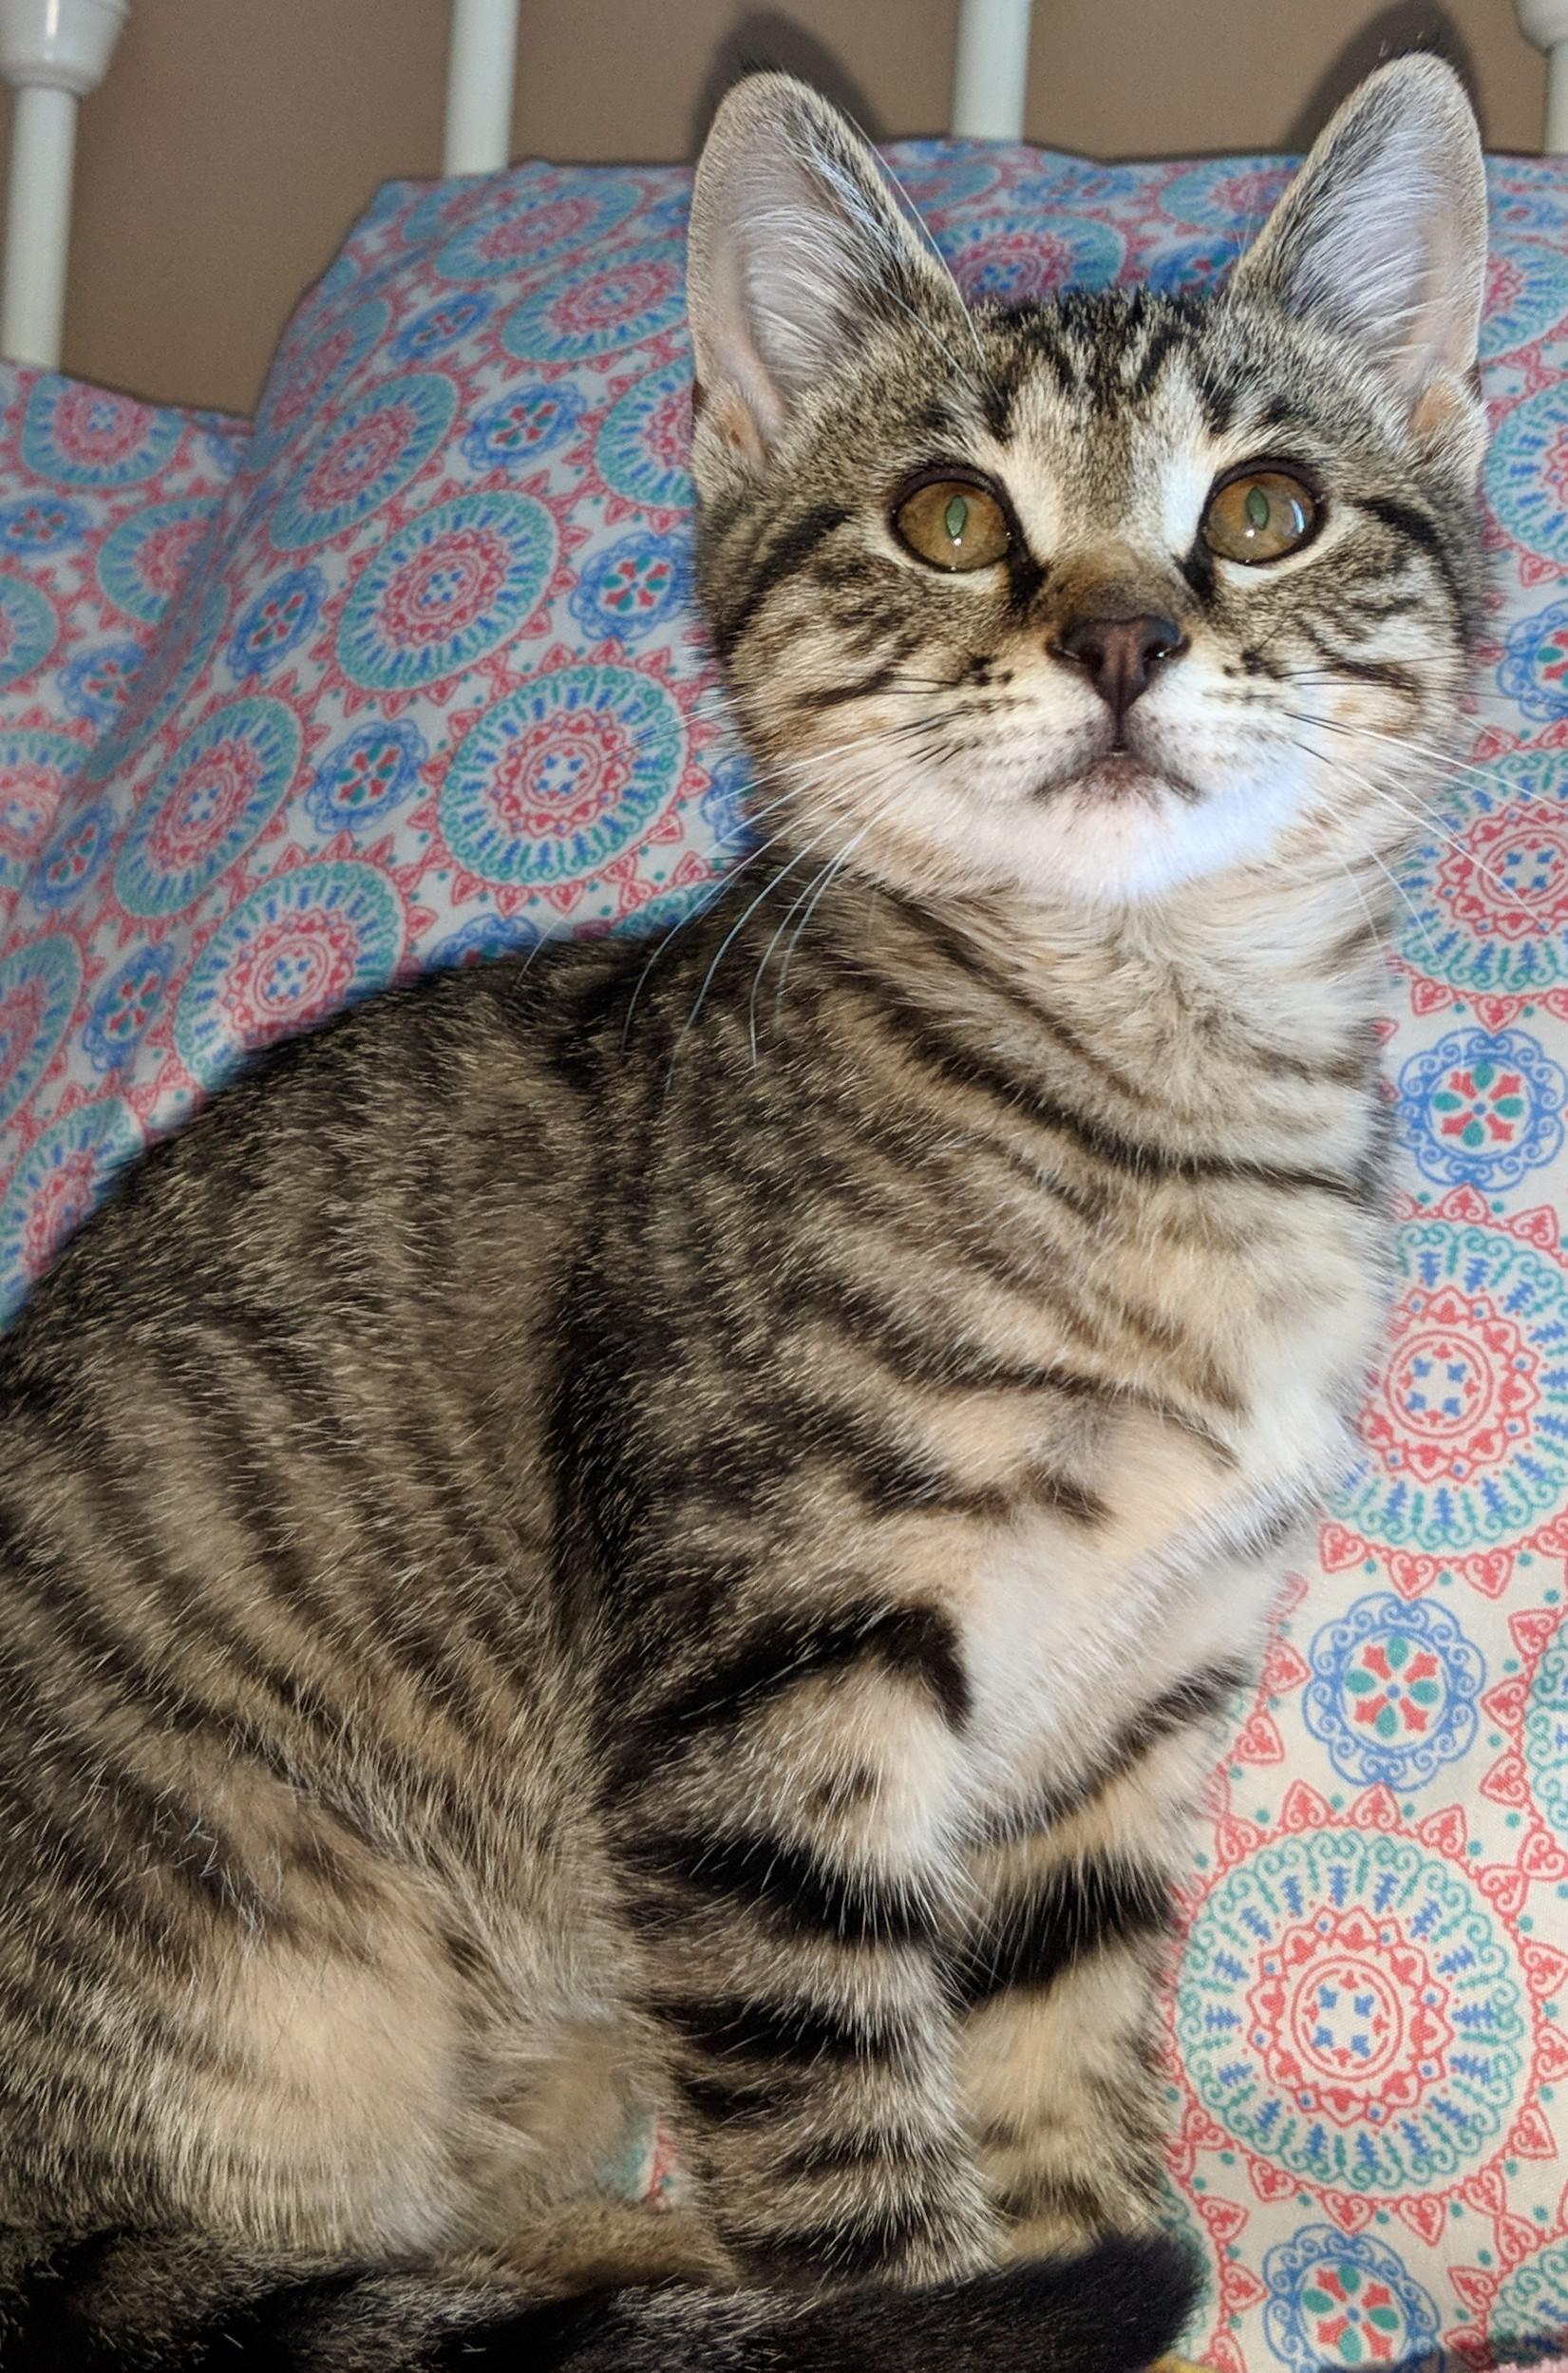 Kitten In 2020 Cats Cat Pics Cute Cats